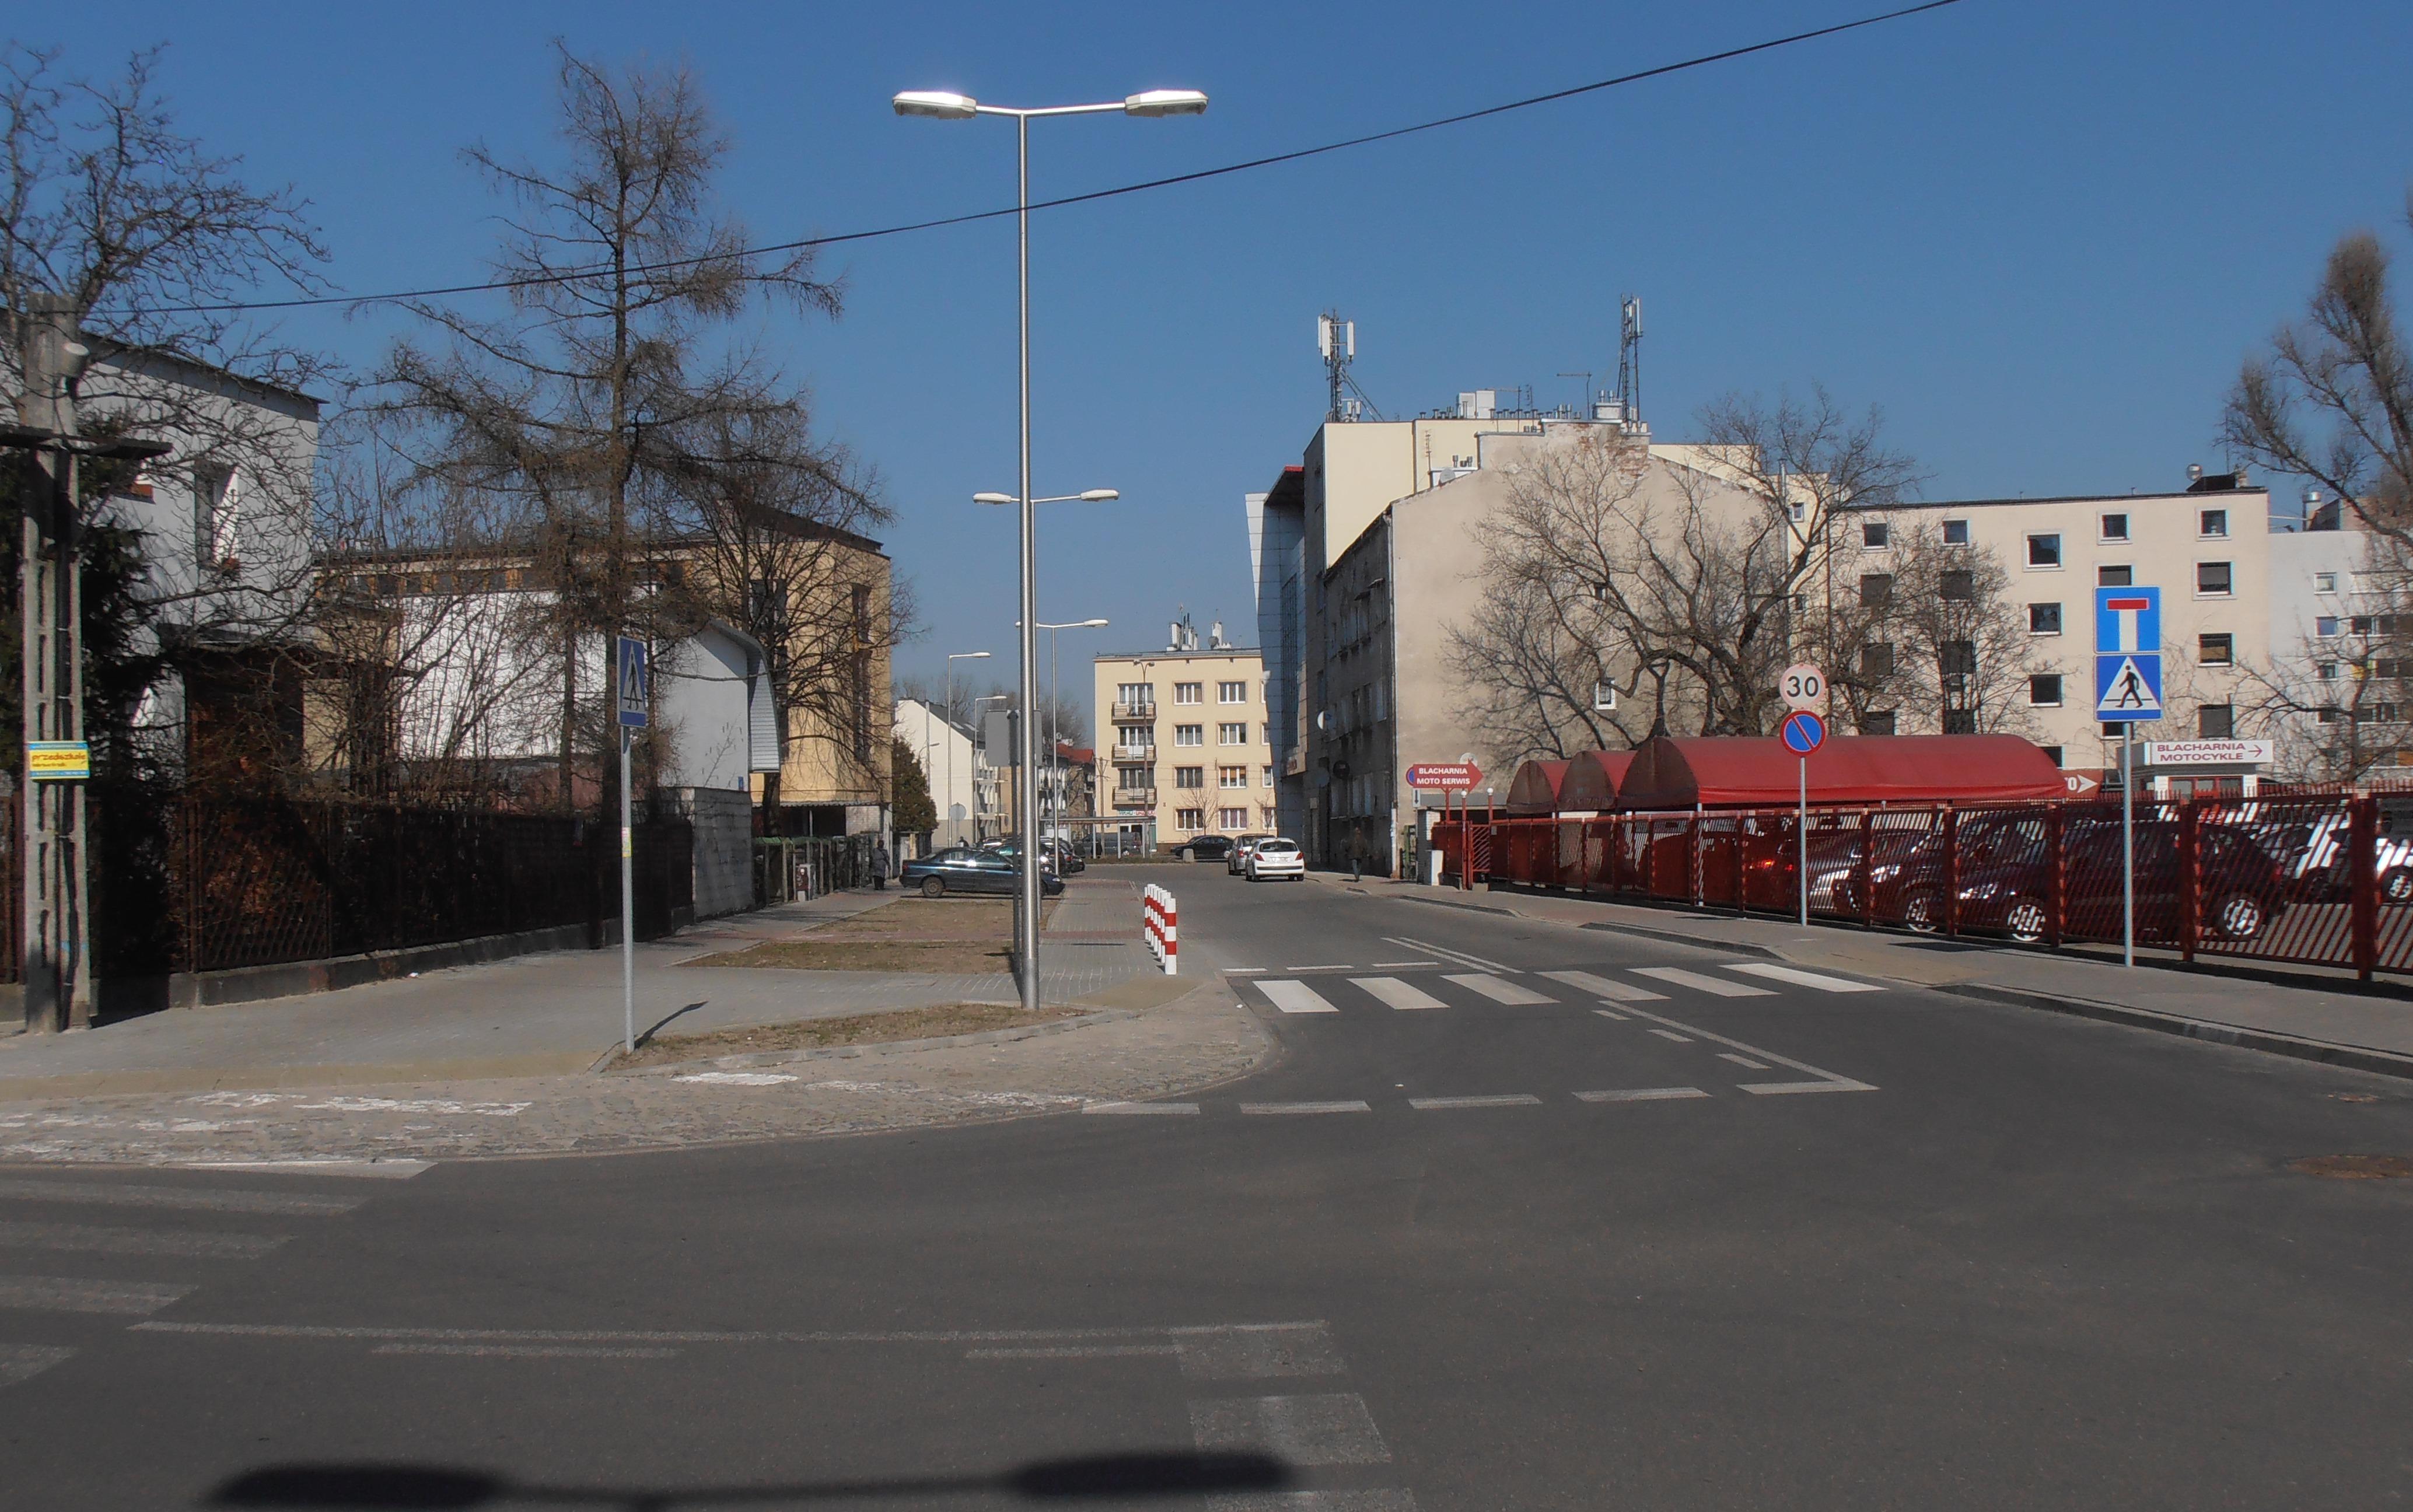 Ulica Witolińska